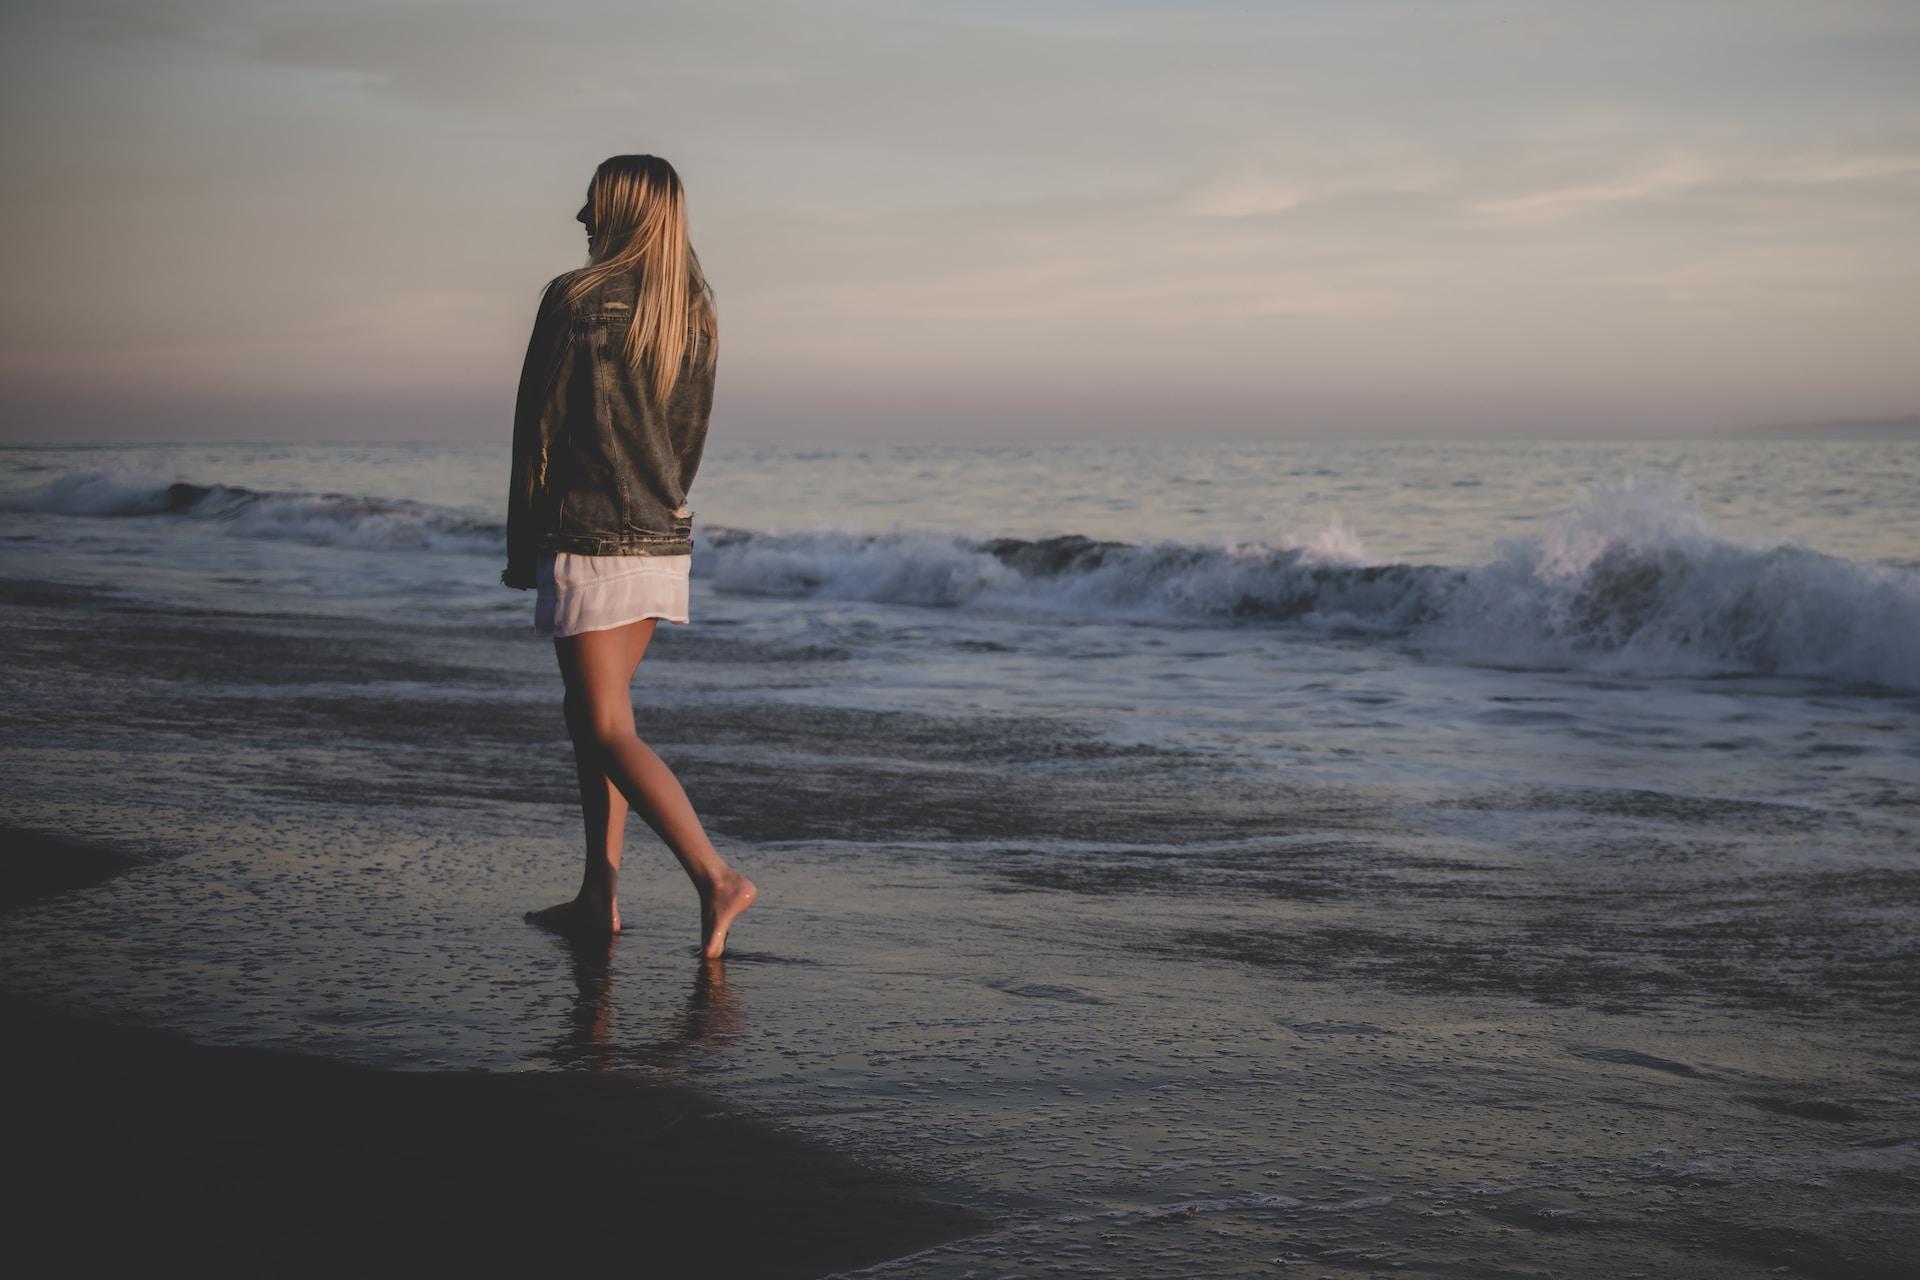 woman walking on seashore under gray sky